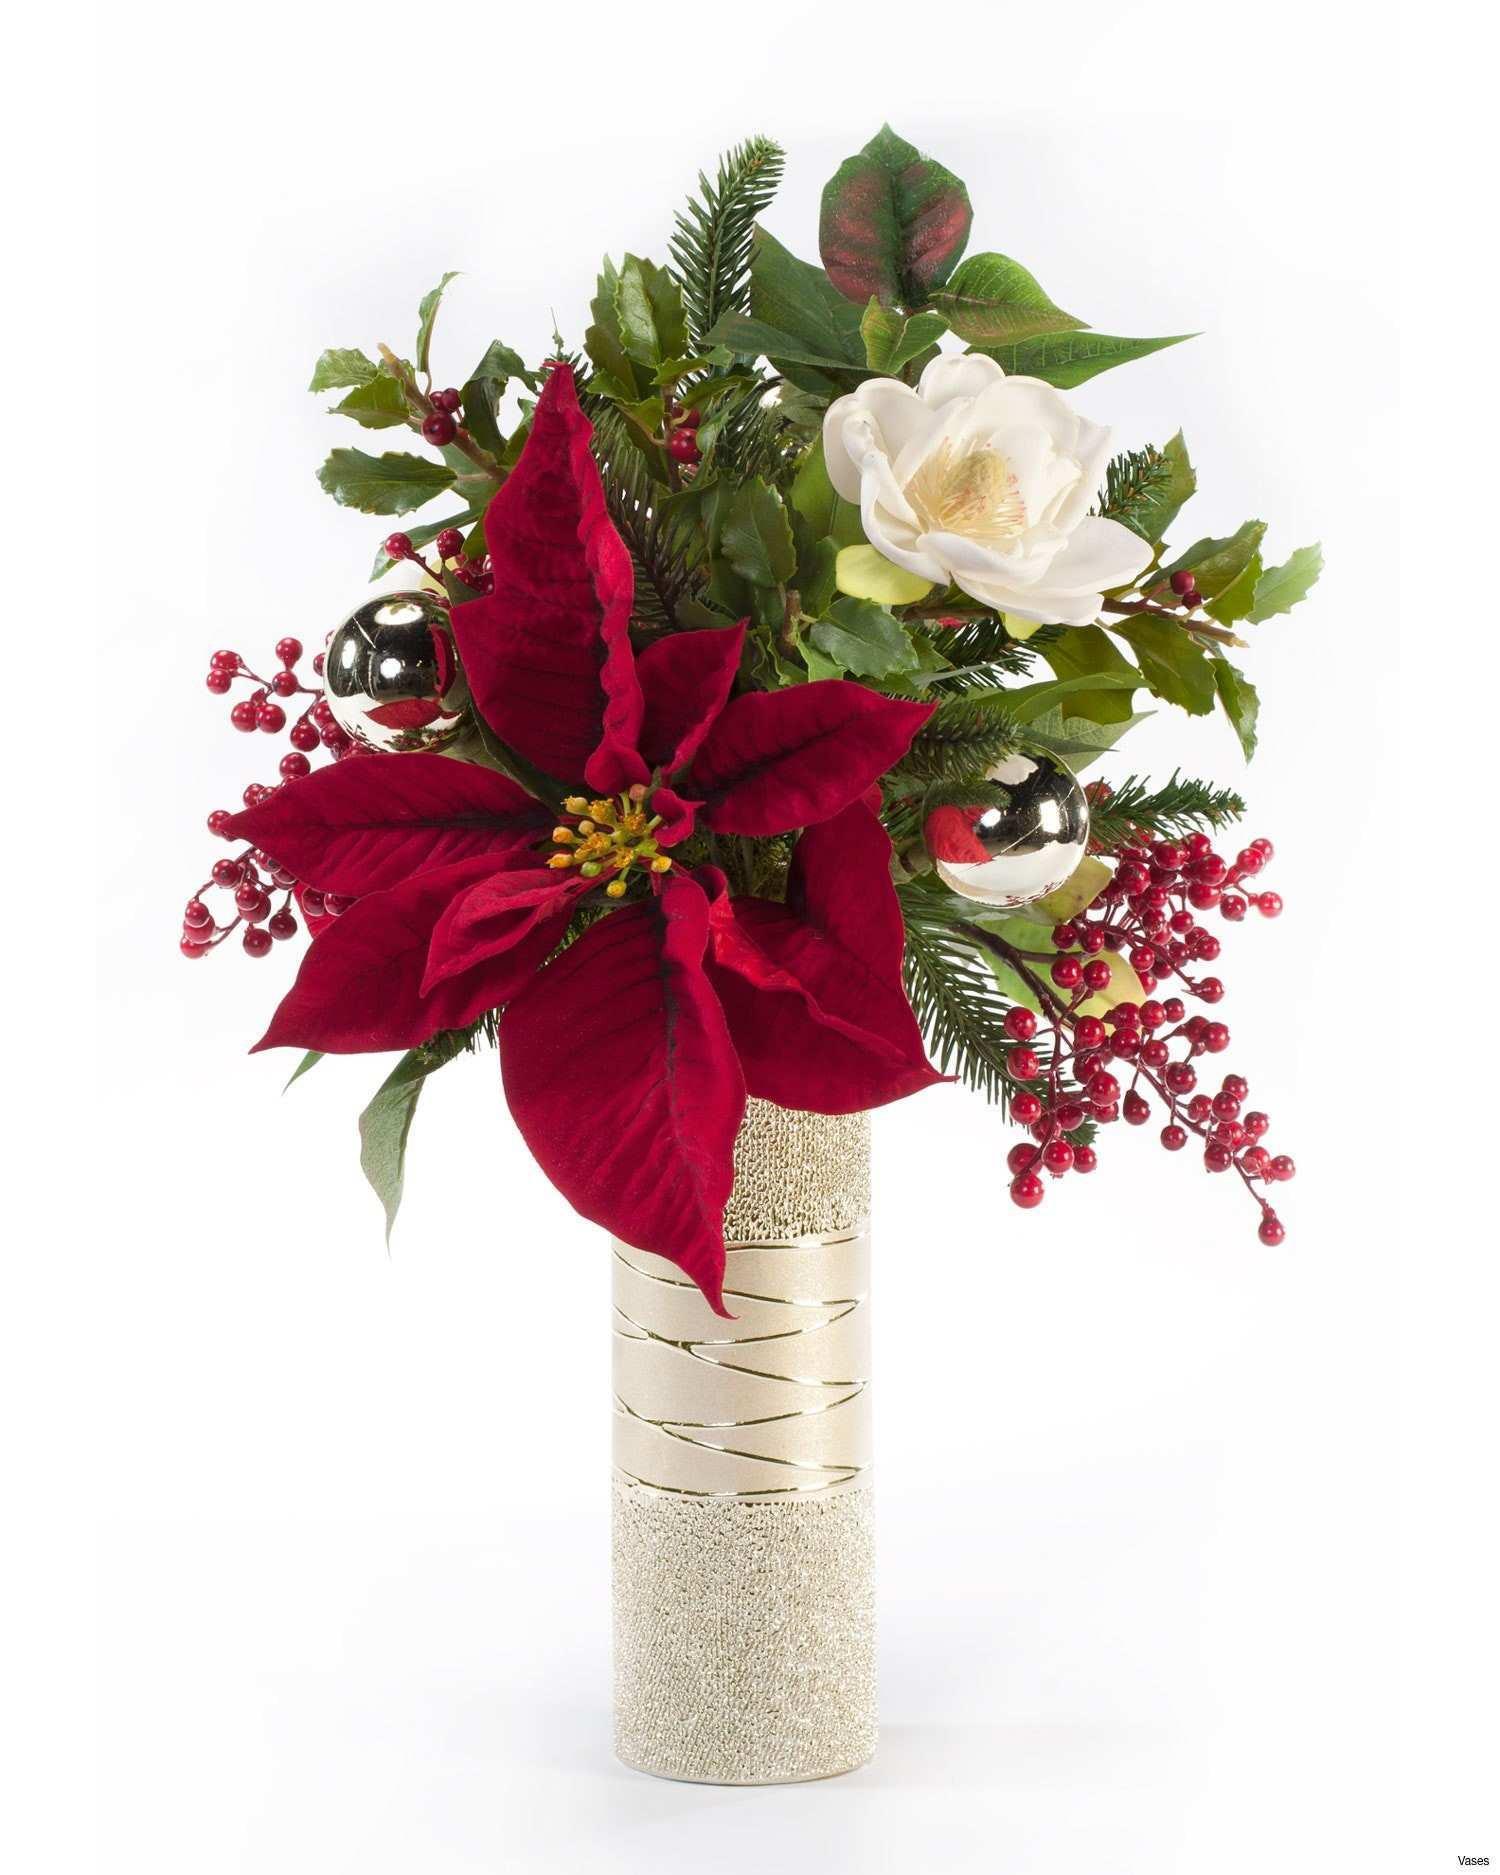 artificial hydrangeas in vase of luxury flower ideas garden ideas in lsa flower colour bud vase red h vases i 0d wing design ideas fake poinsettias